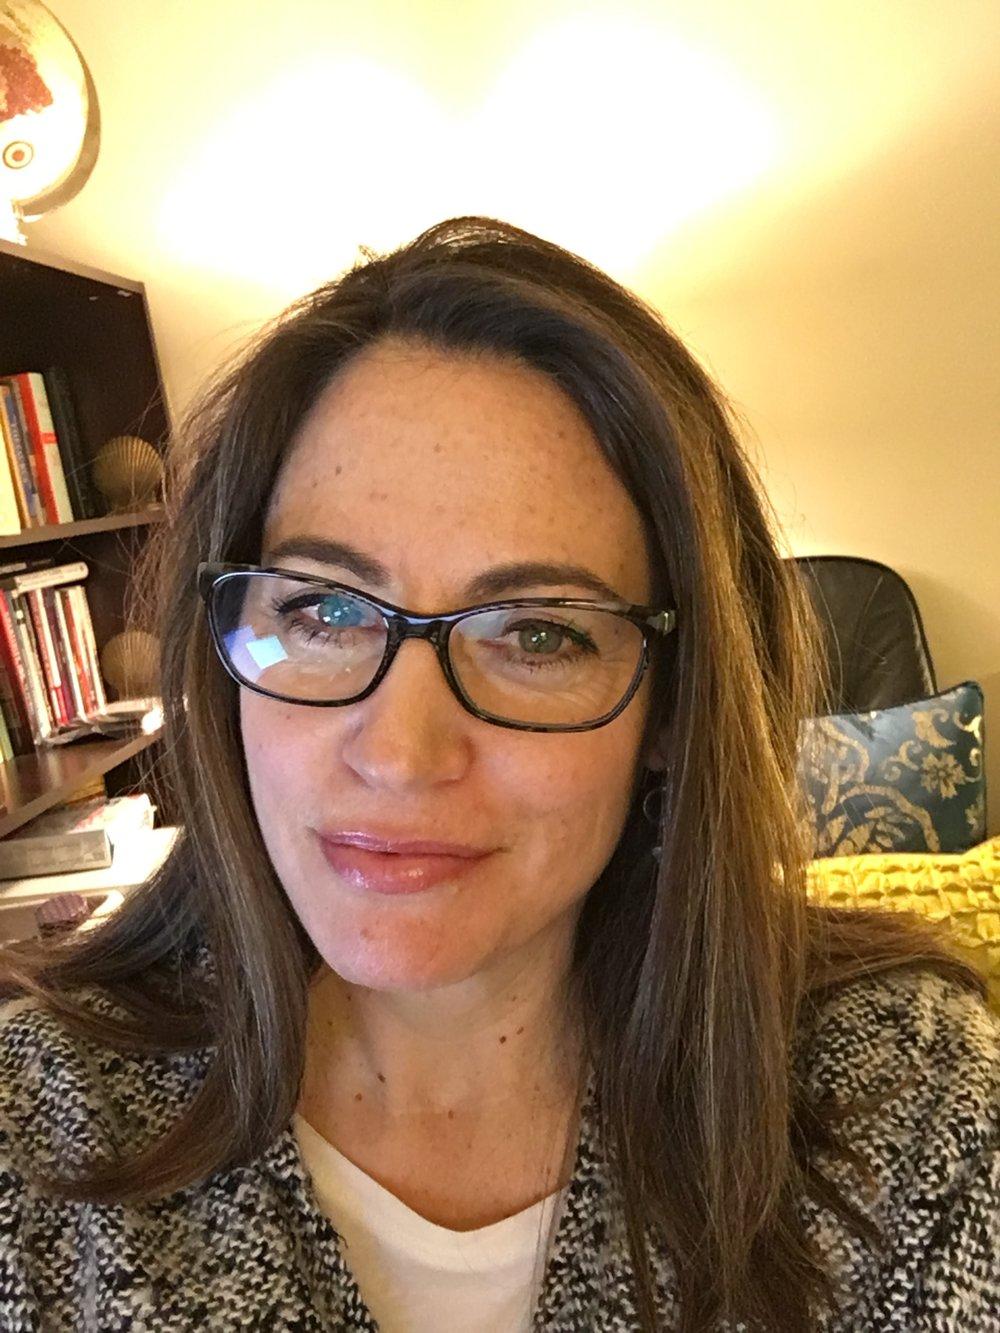 Leila Selfie Feb2017.jpeg